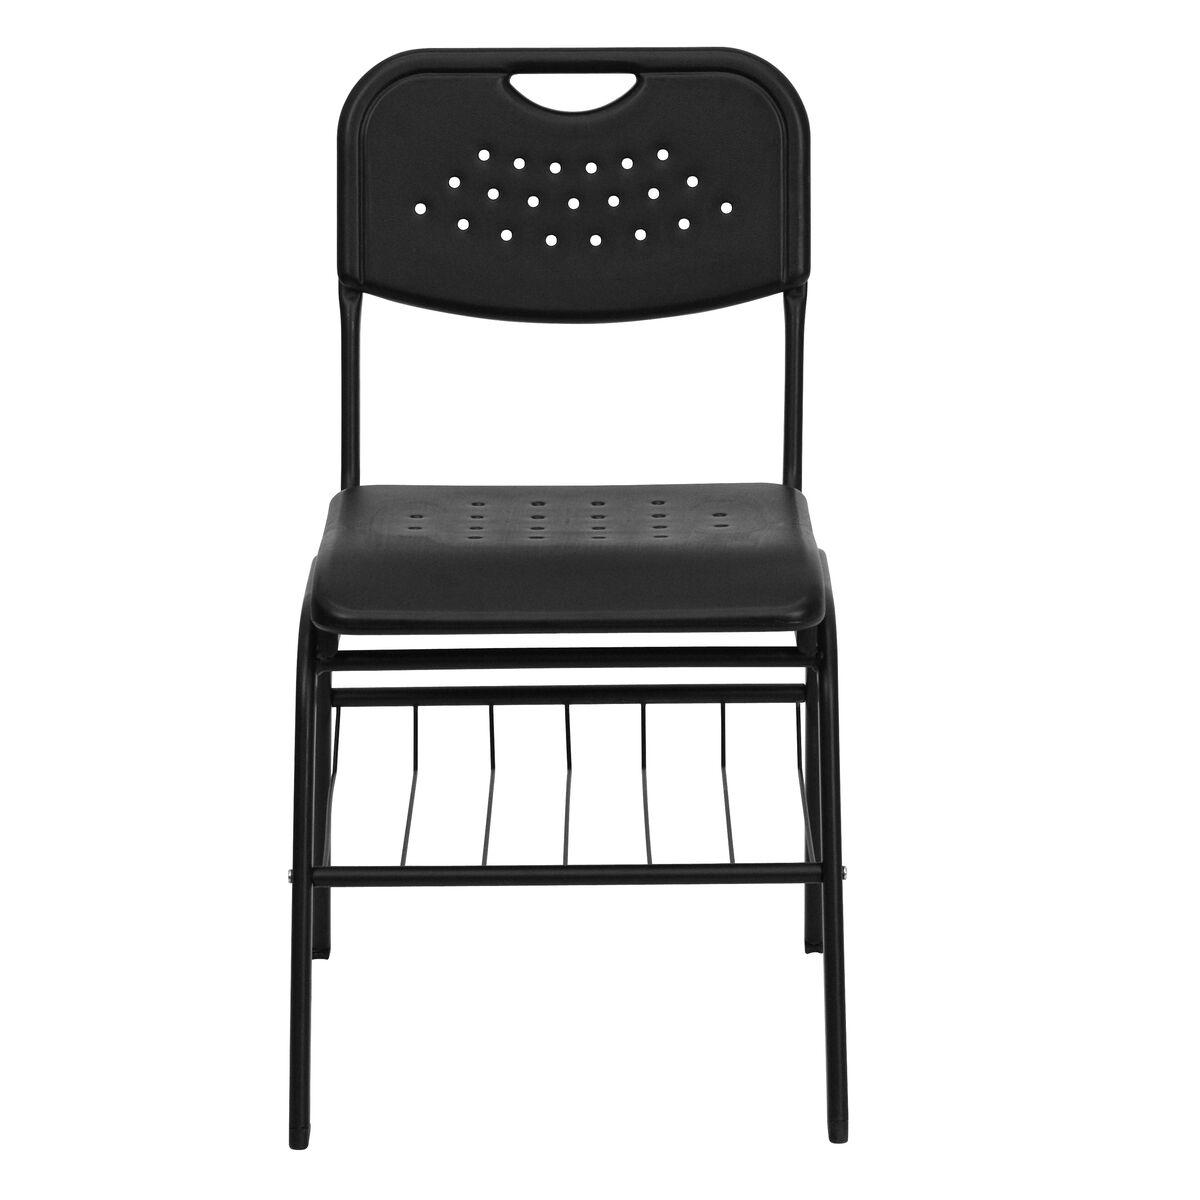 Black plastic student chair rut gk bk bas gg